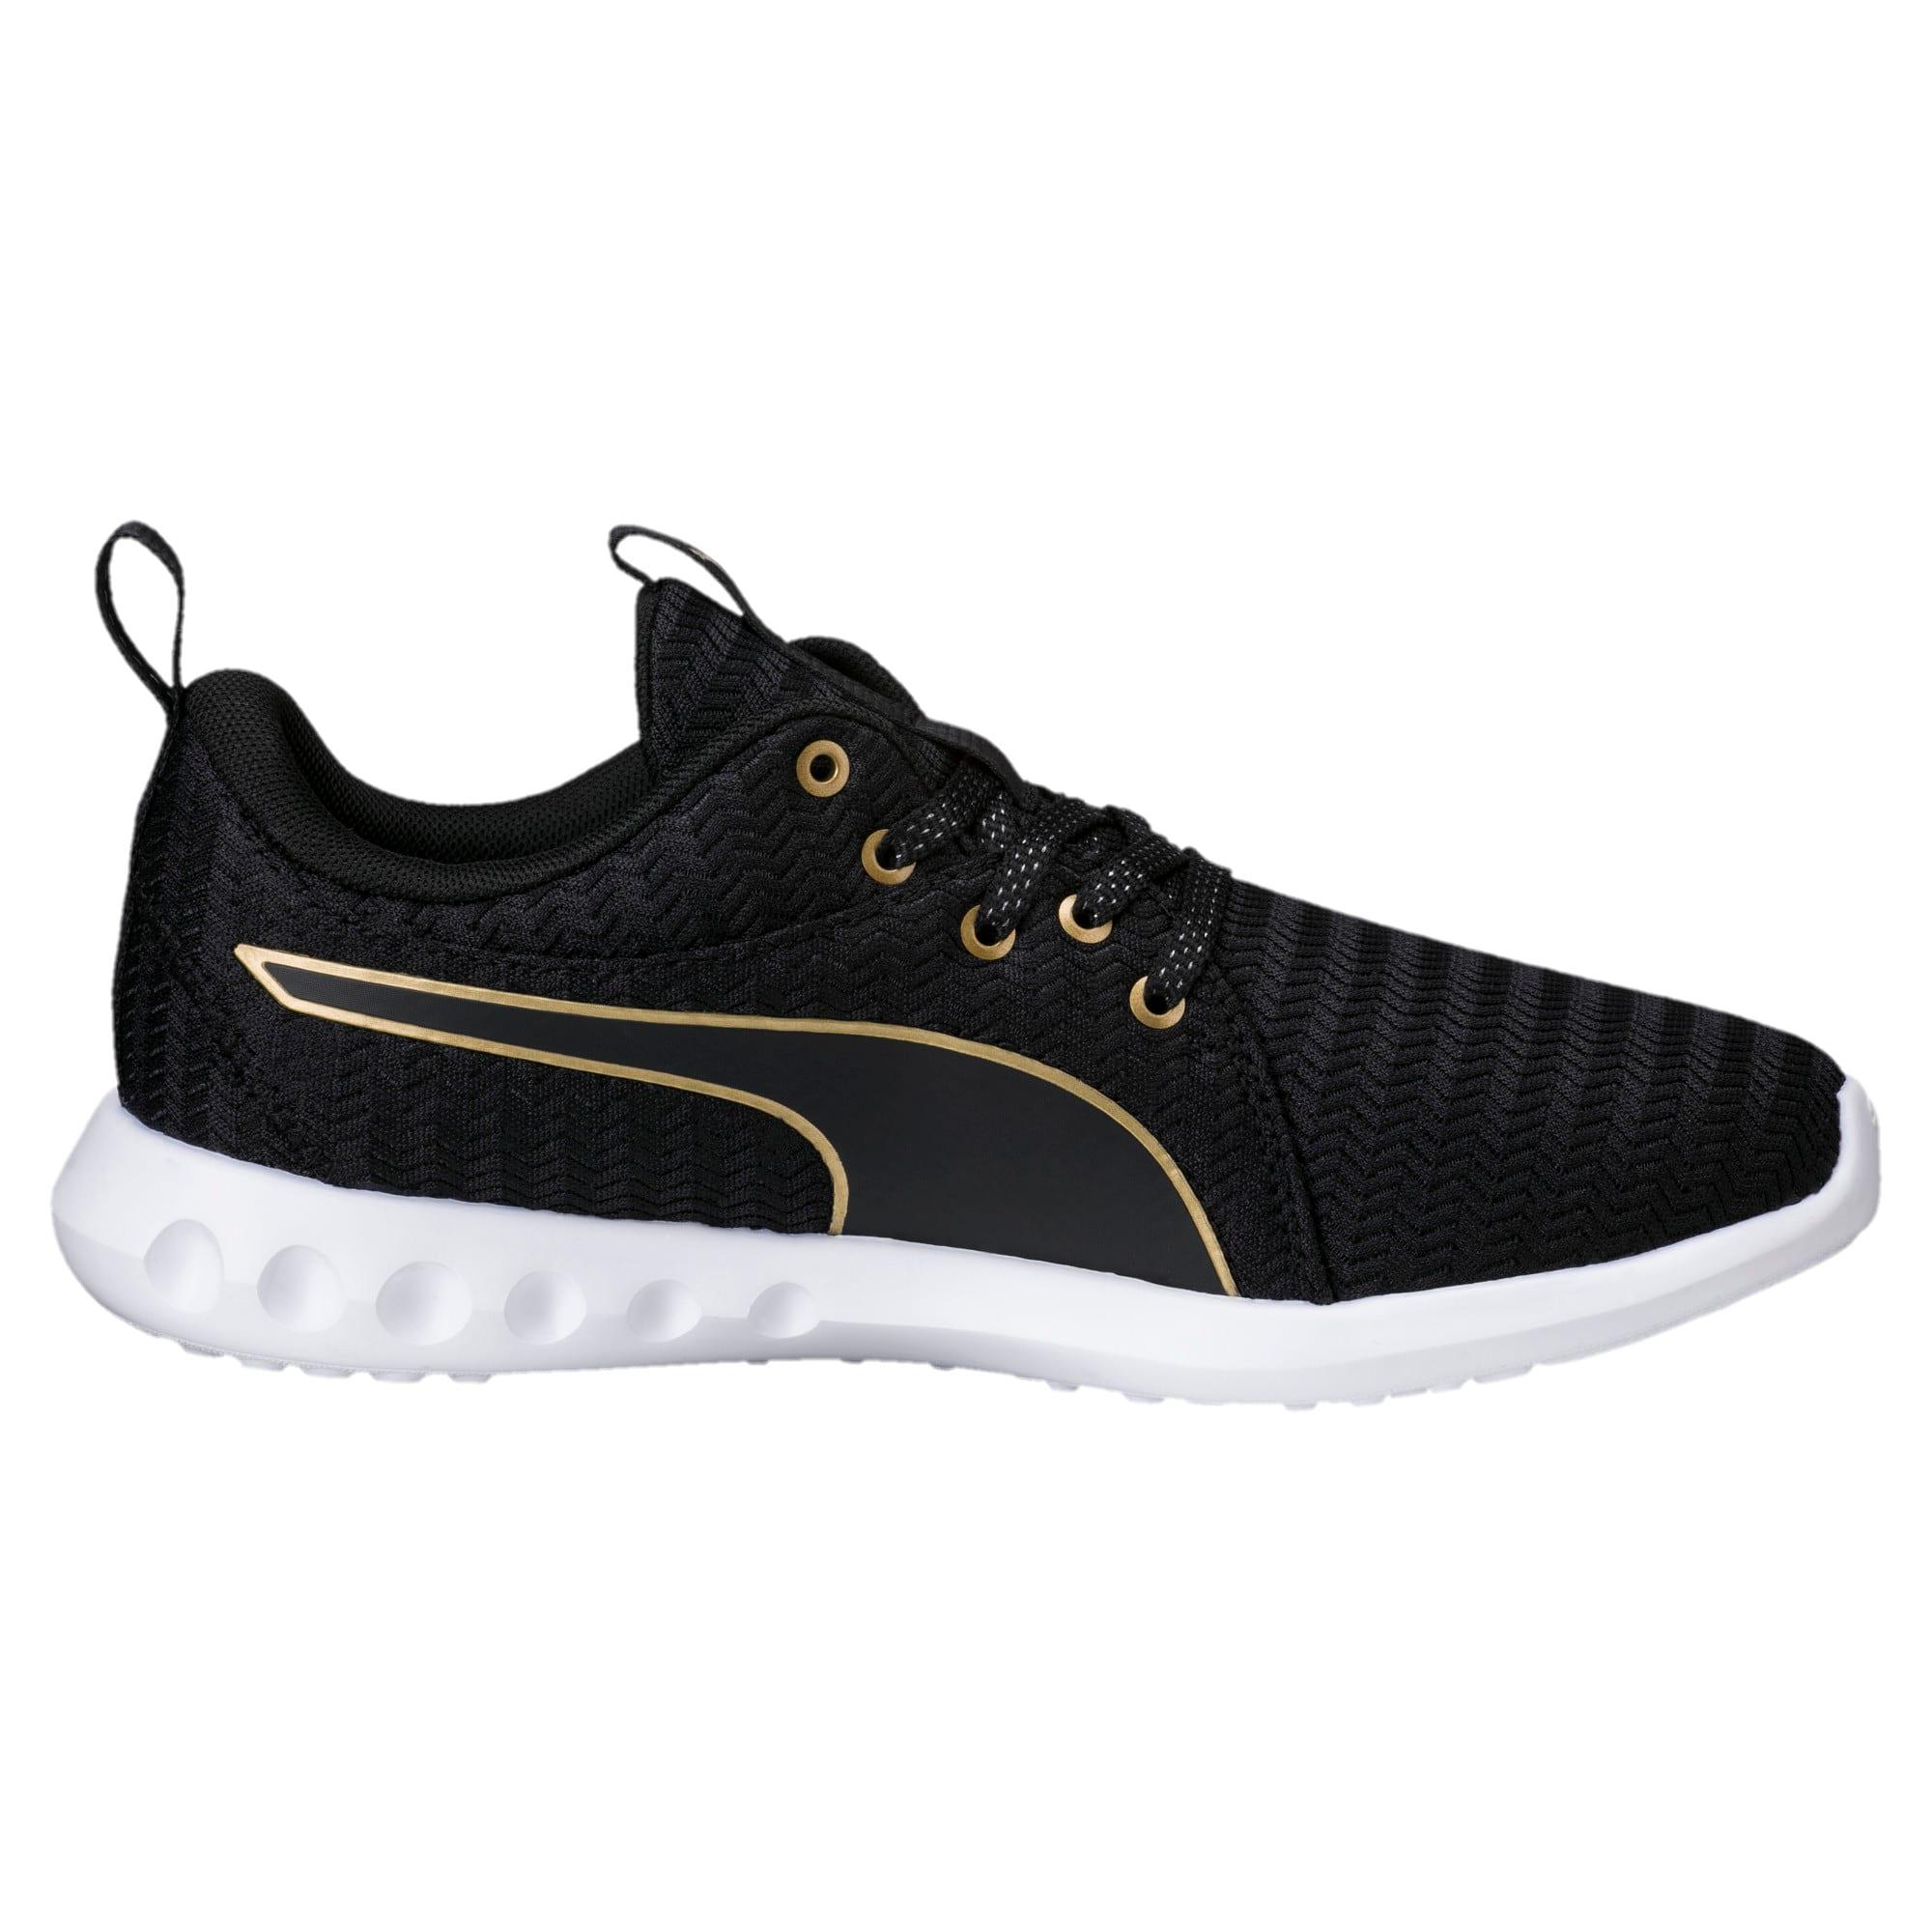 Thumbnail 3 of Carson 2 Metallic Women's Running Shoes, Puma Black-Gold, medium